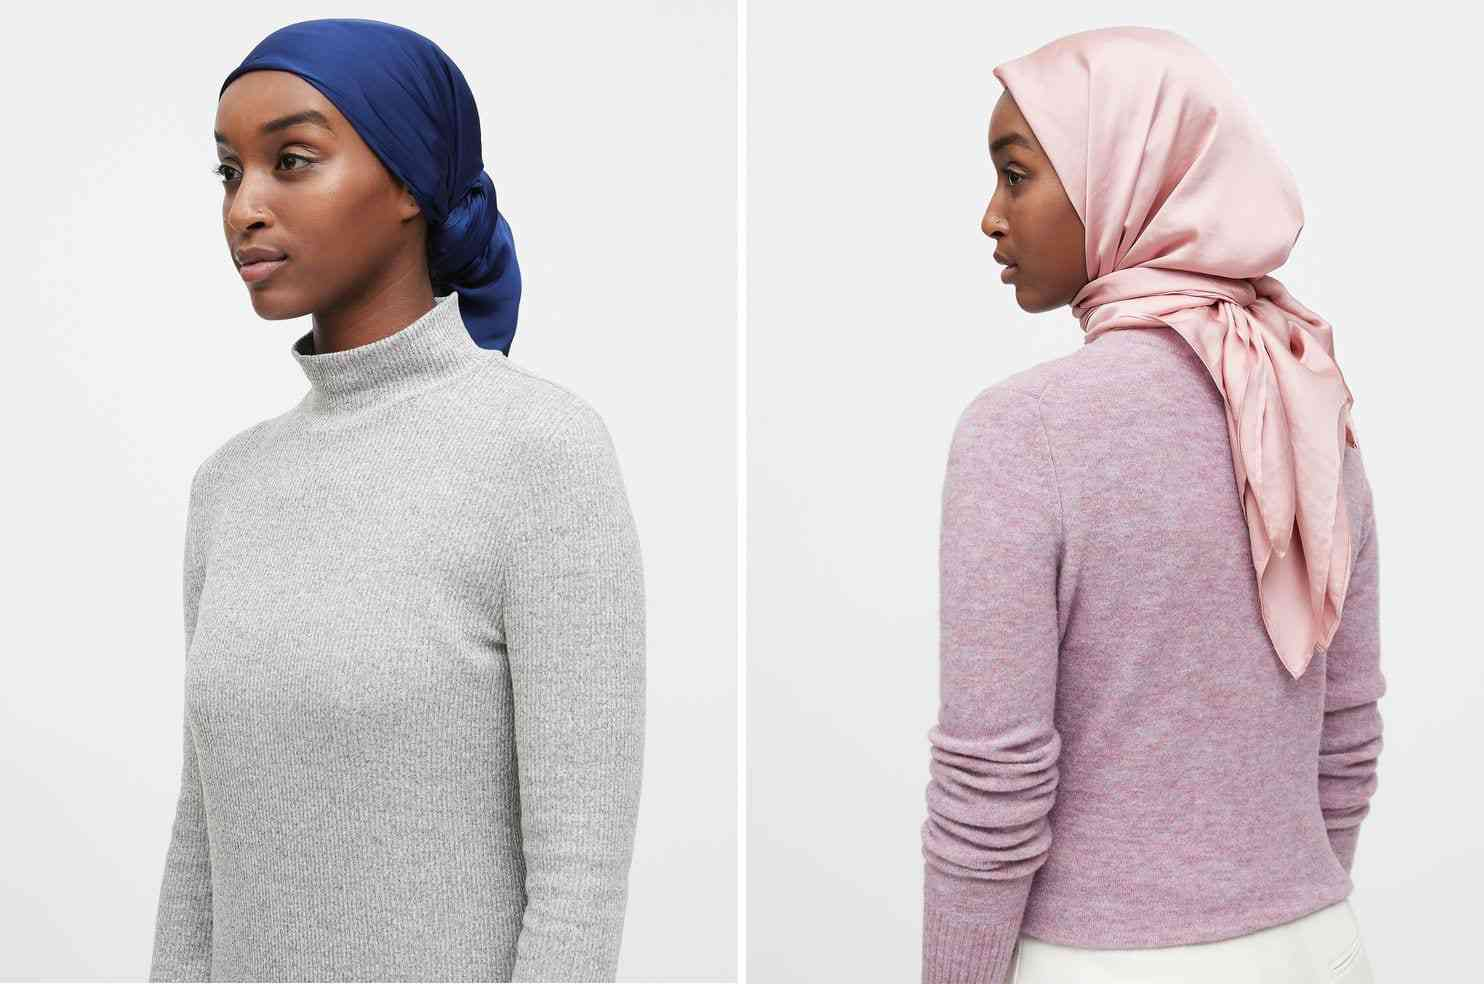 USA, Banana Republic ora vende anche Hijab